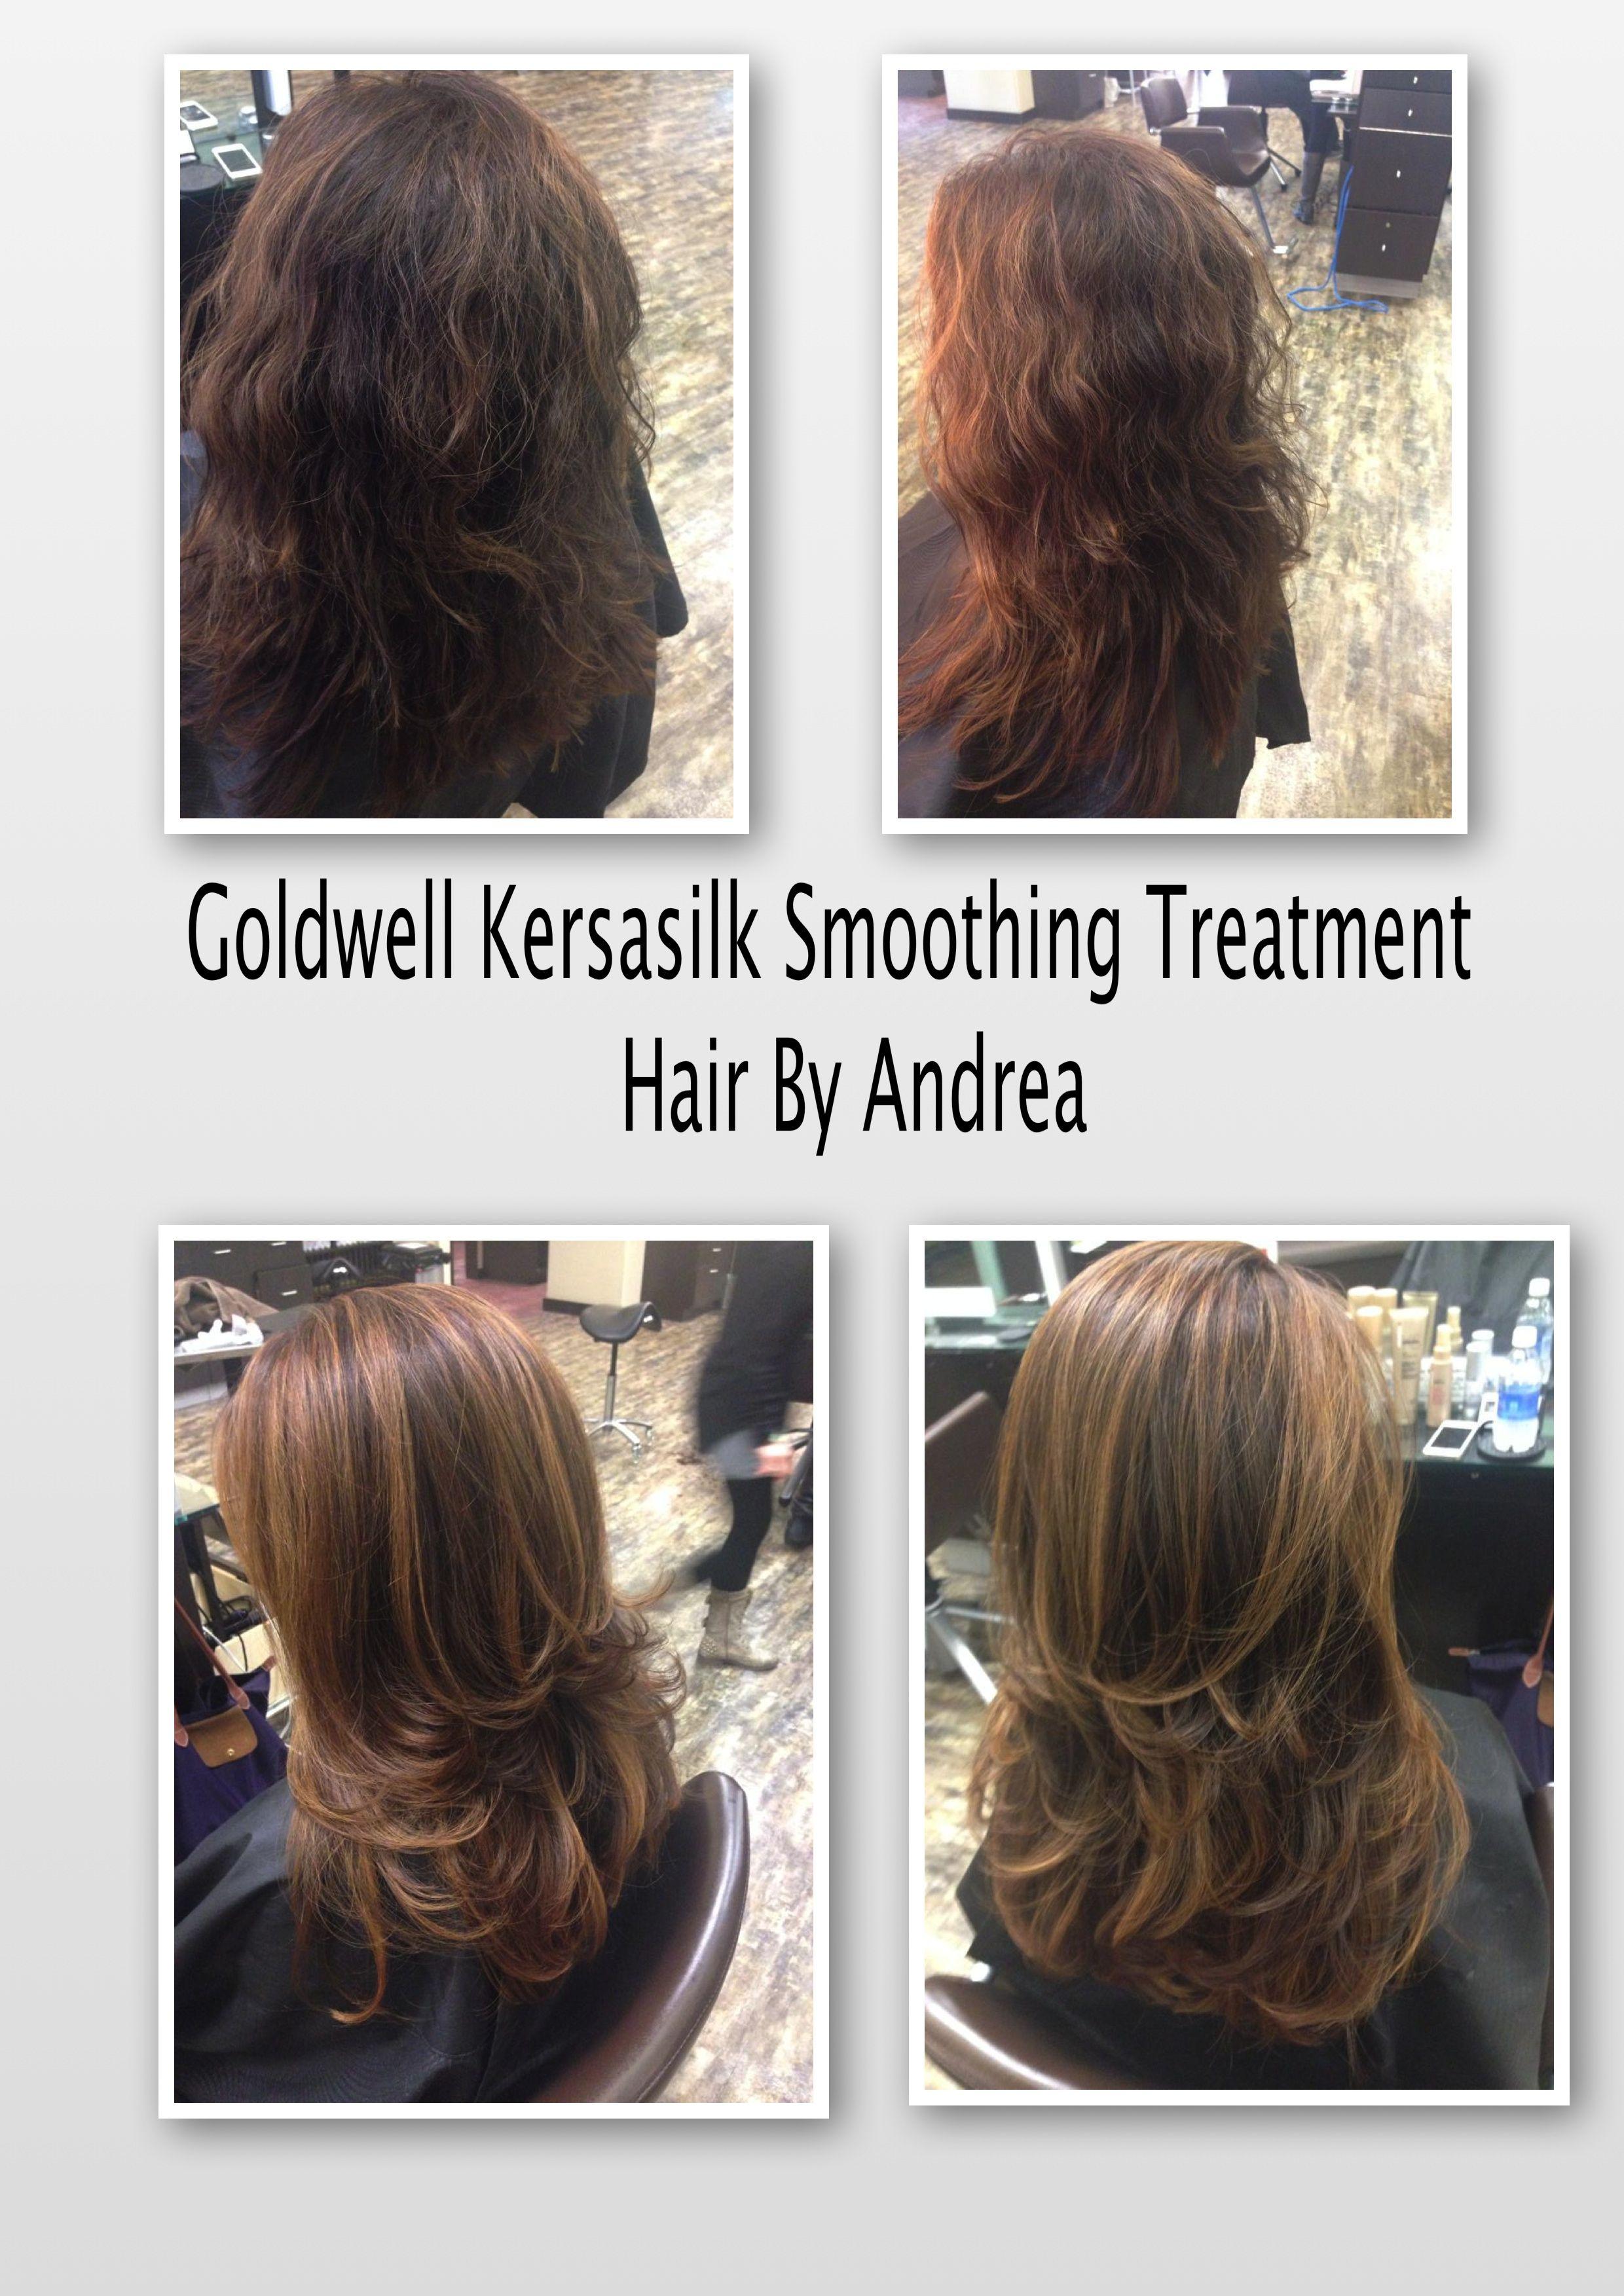 Goldwell Kerasilk Smoothing Treatment Hair By Andrea Andrea At